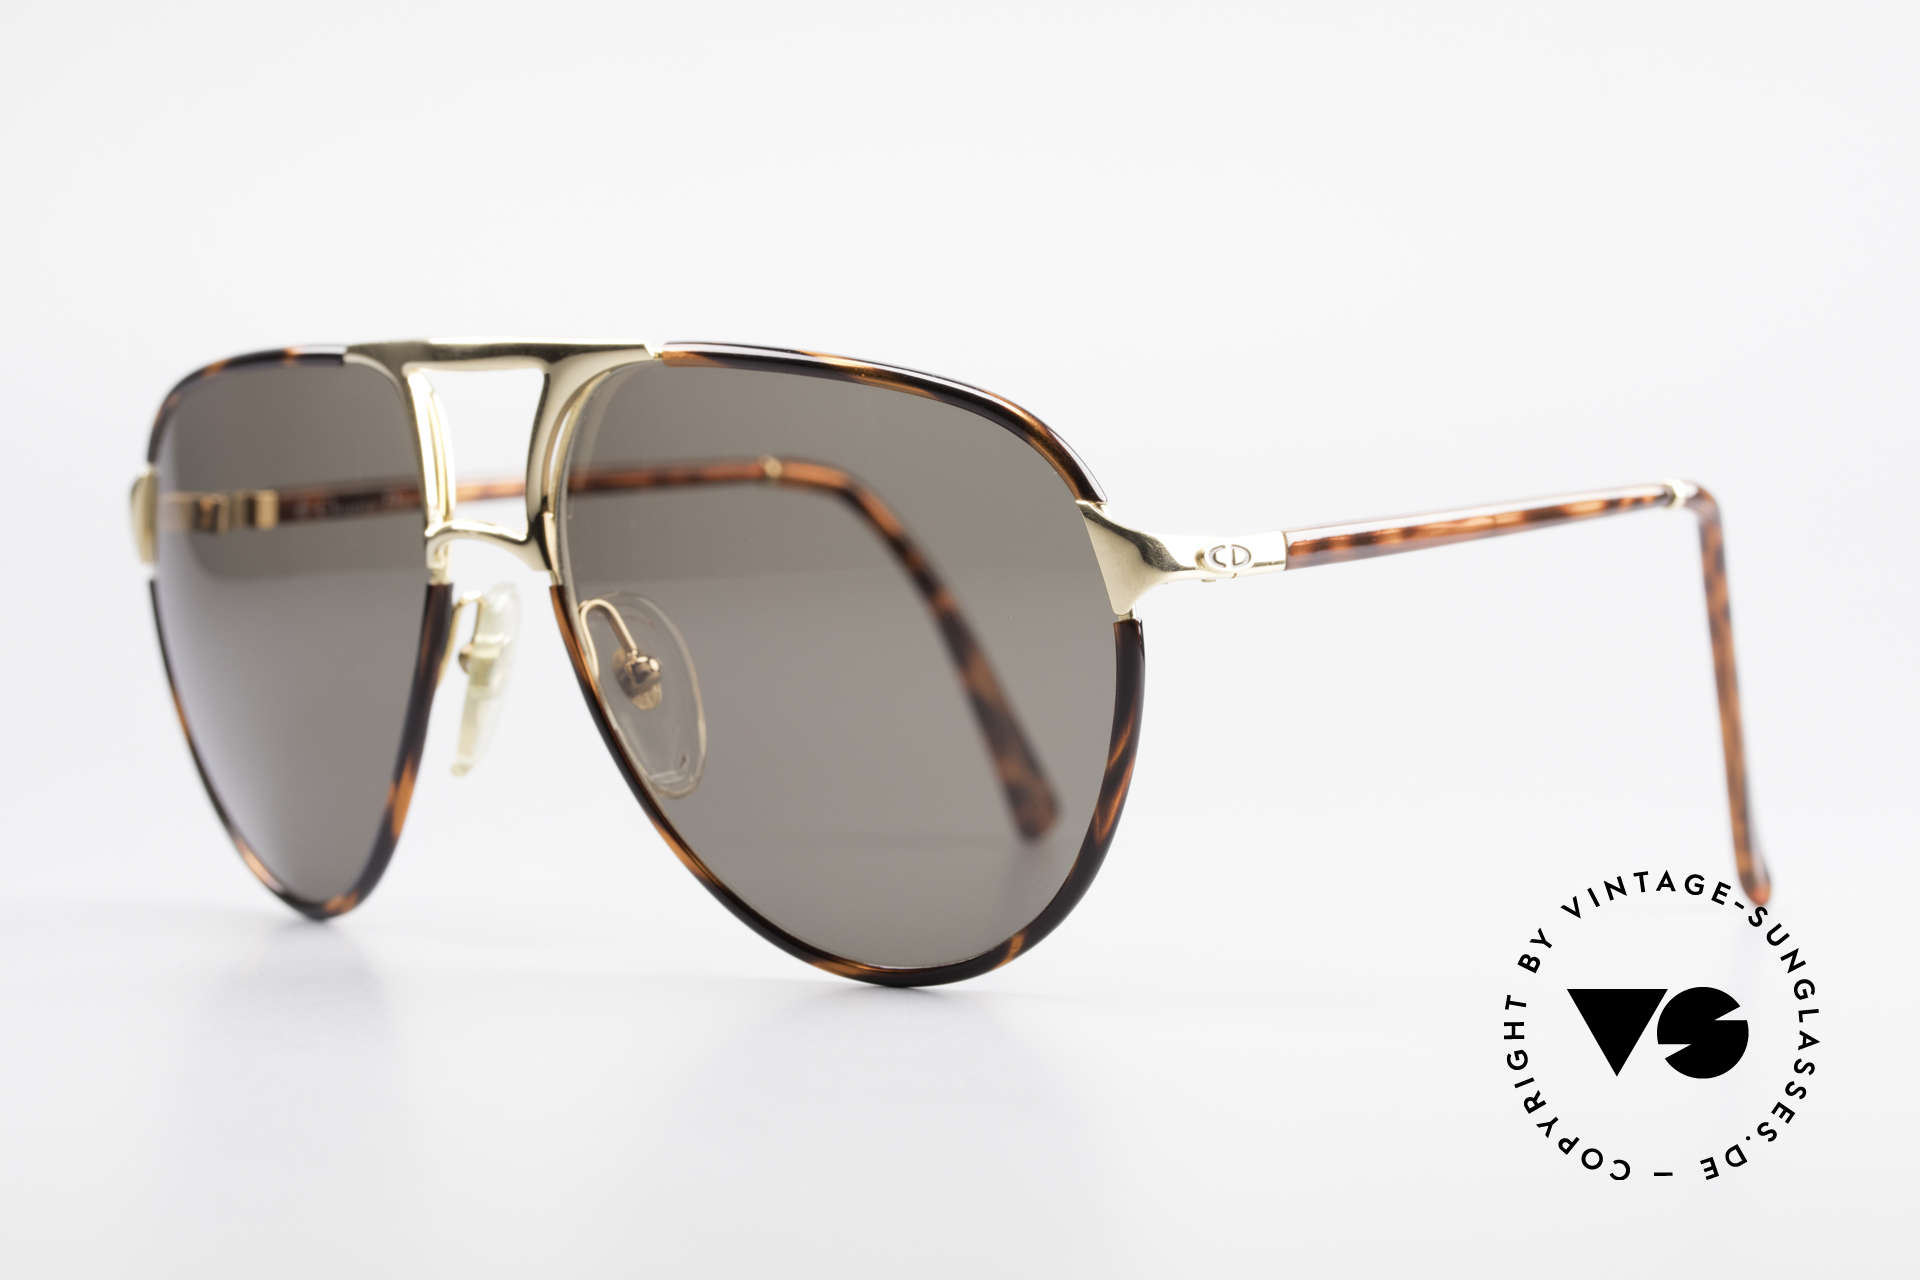 Christian Dior 2505 Aviator Designer Sunglasses, Top quality (gold-plated metal & 100% UV prot.), Made for Men